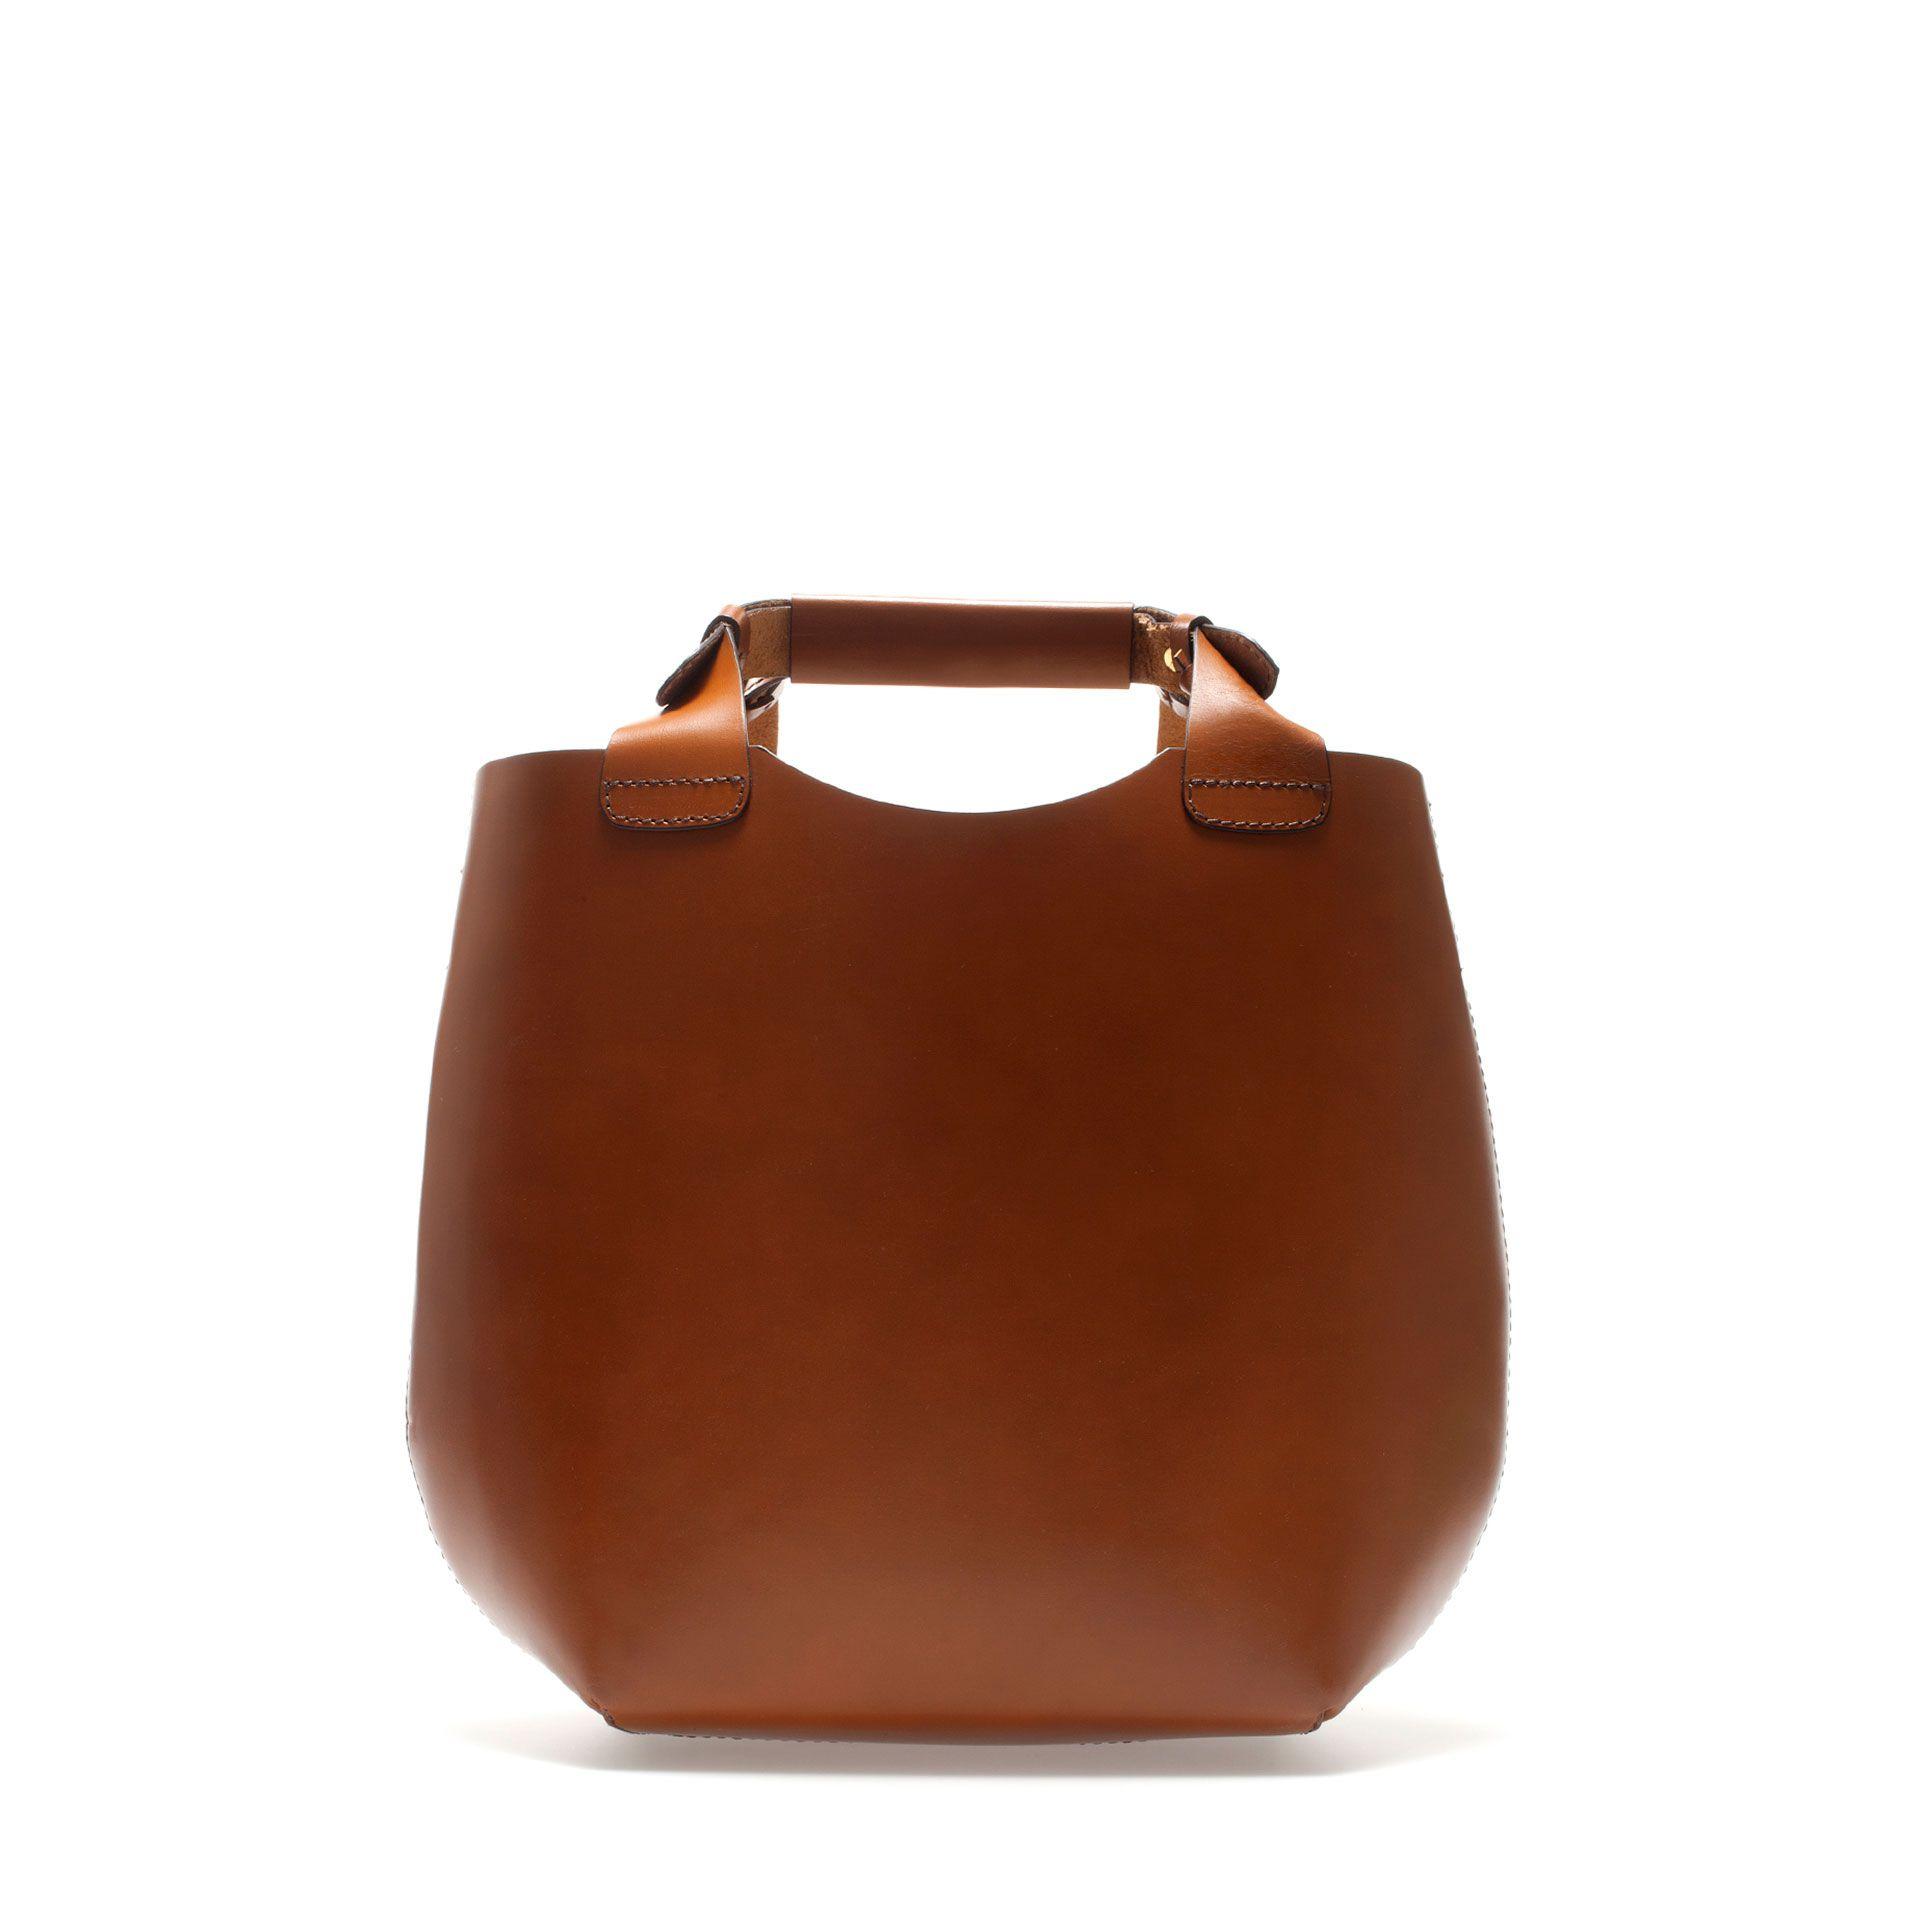 Mini leather tote bag zara - Mini Leather Tote Bag By Zara